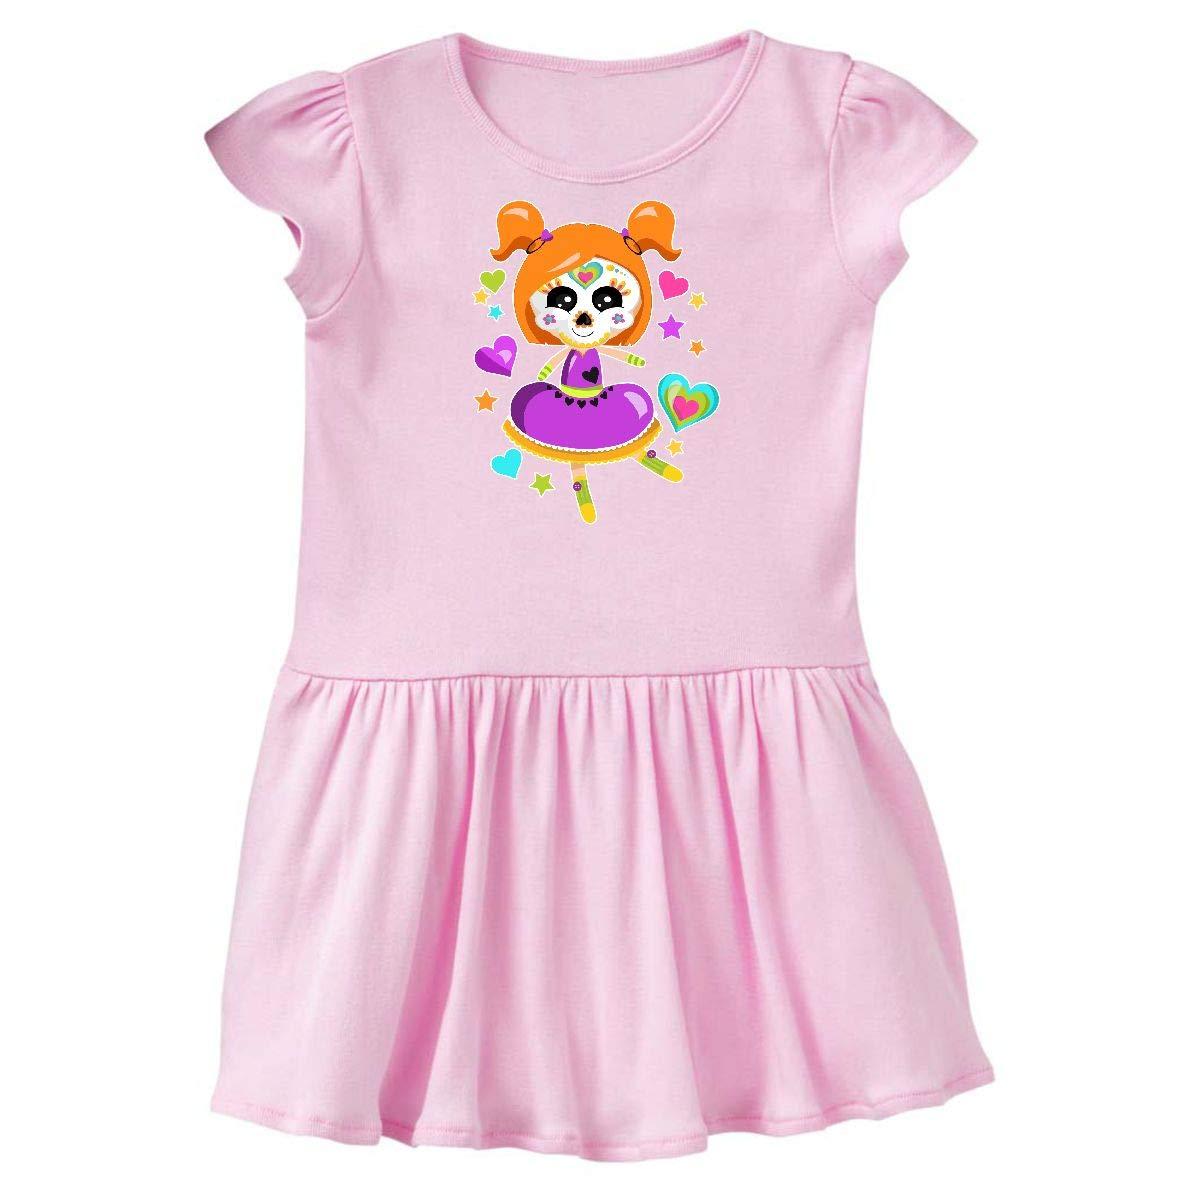 inktastic - Dancing Decorative Skull Girl Infant Dress 14-204303-197